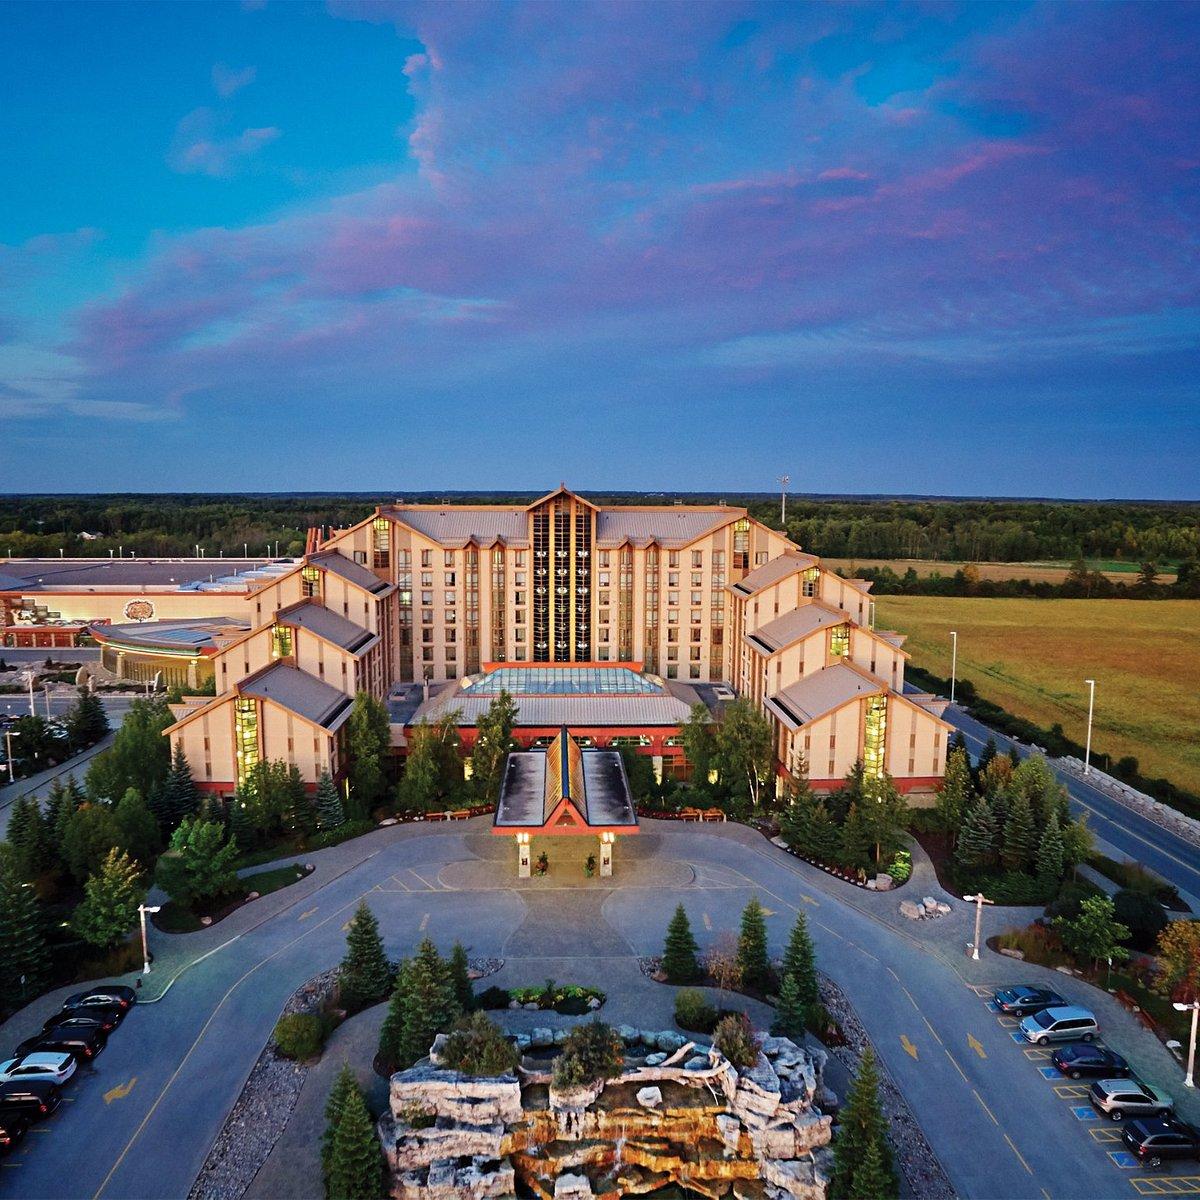 Casino Rama Resort Orillia 2021 All You Need To Know Before You Go With Photos Tripadvisor